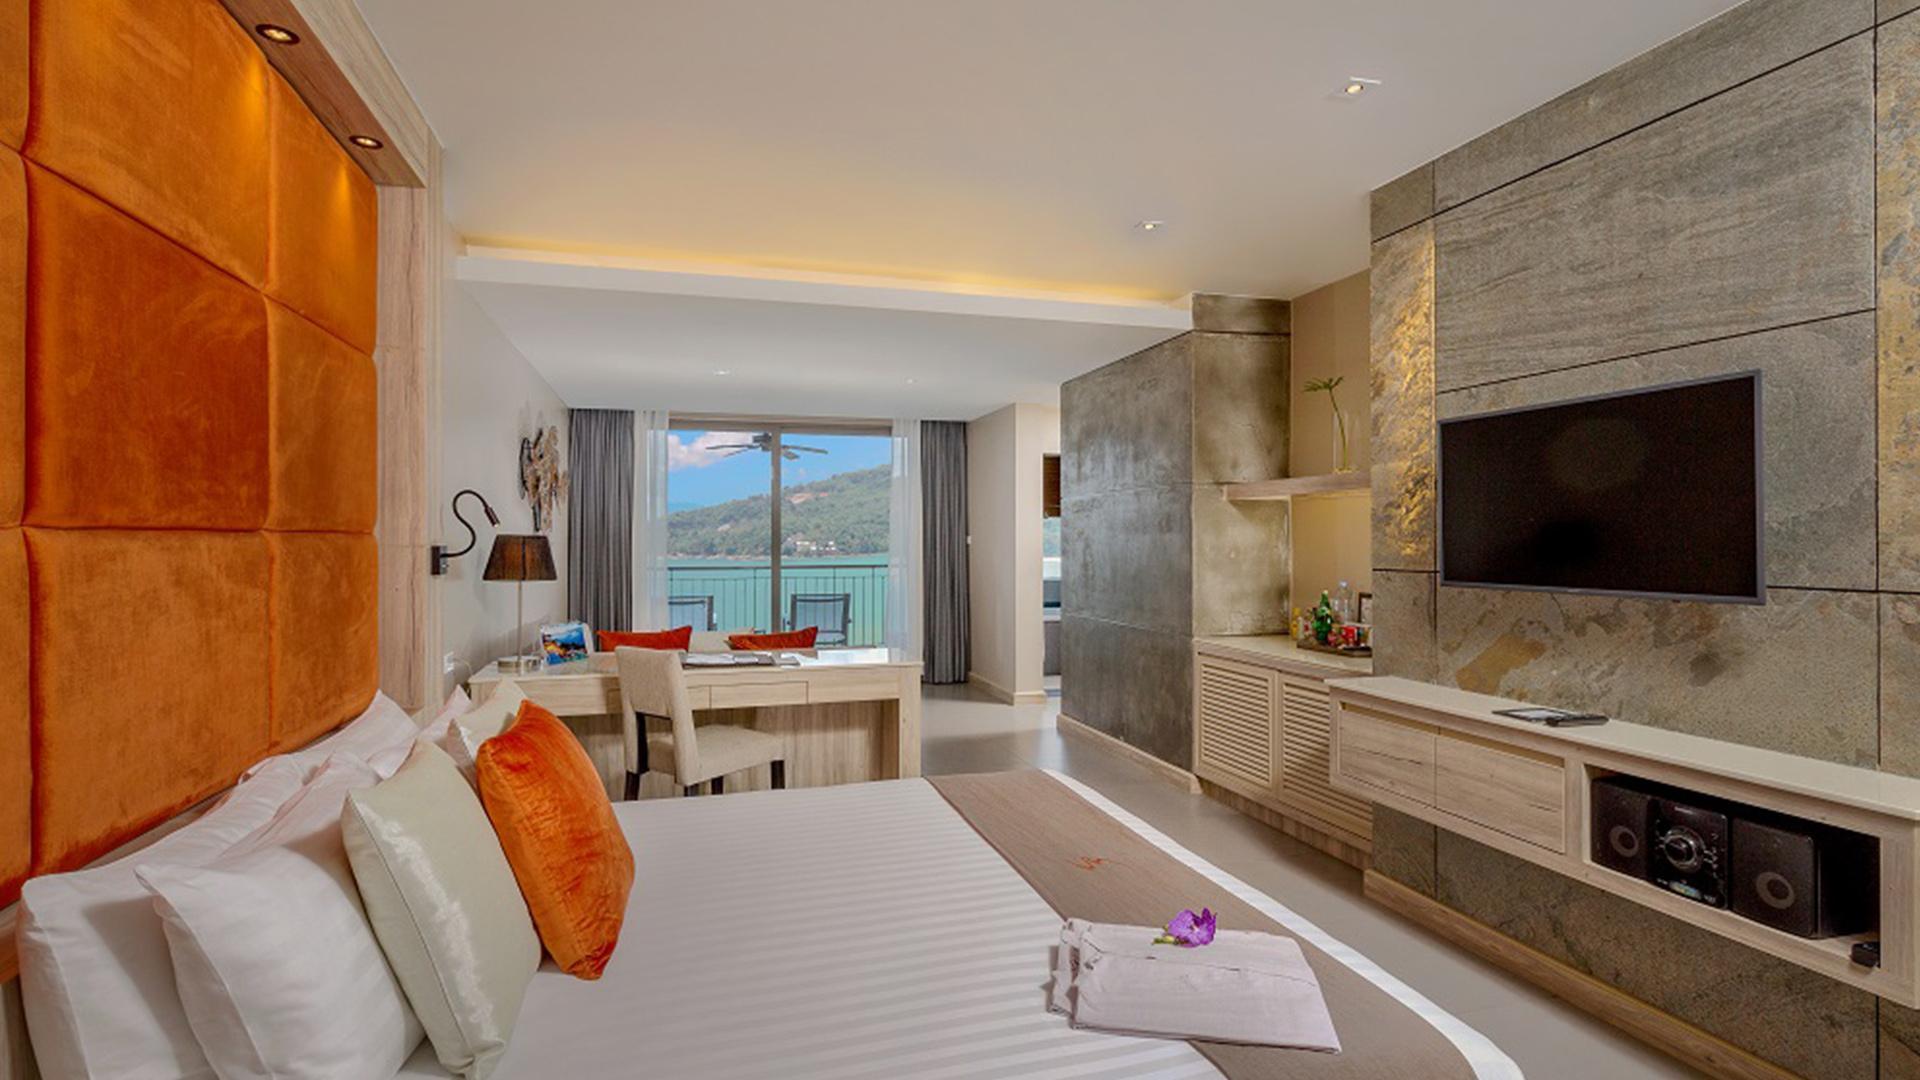 Sea View Jacuzzi Junior Suite image 1 at Cape Sienna Phuket Gourmet Hotel & Villas by Amphoe Kathu, Chang Wat Phuket, Thailand